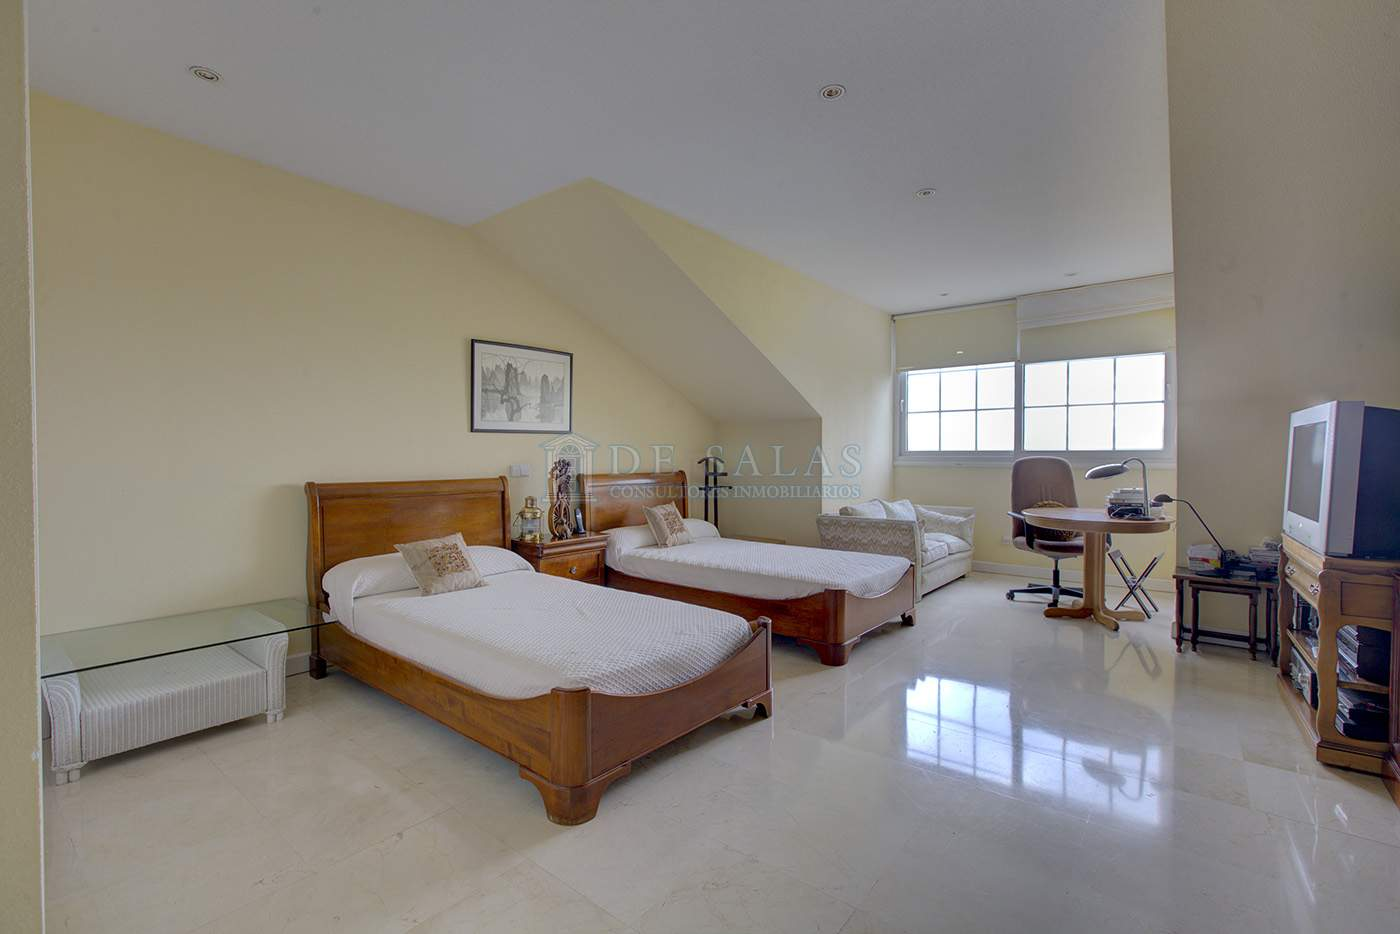 Dormitorio-IMG_7420_1_2 copia Chalet La Moraleja